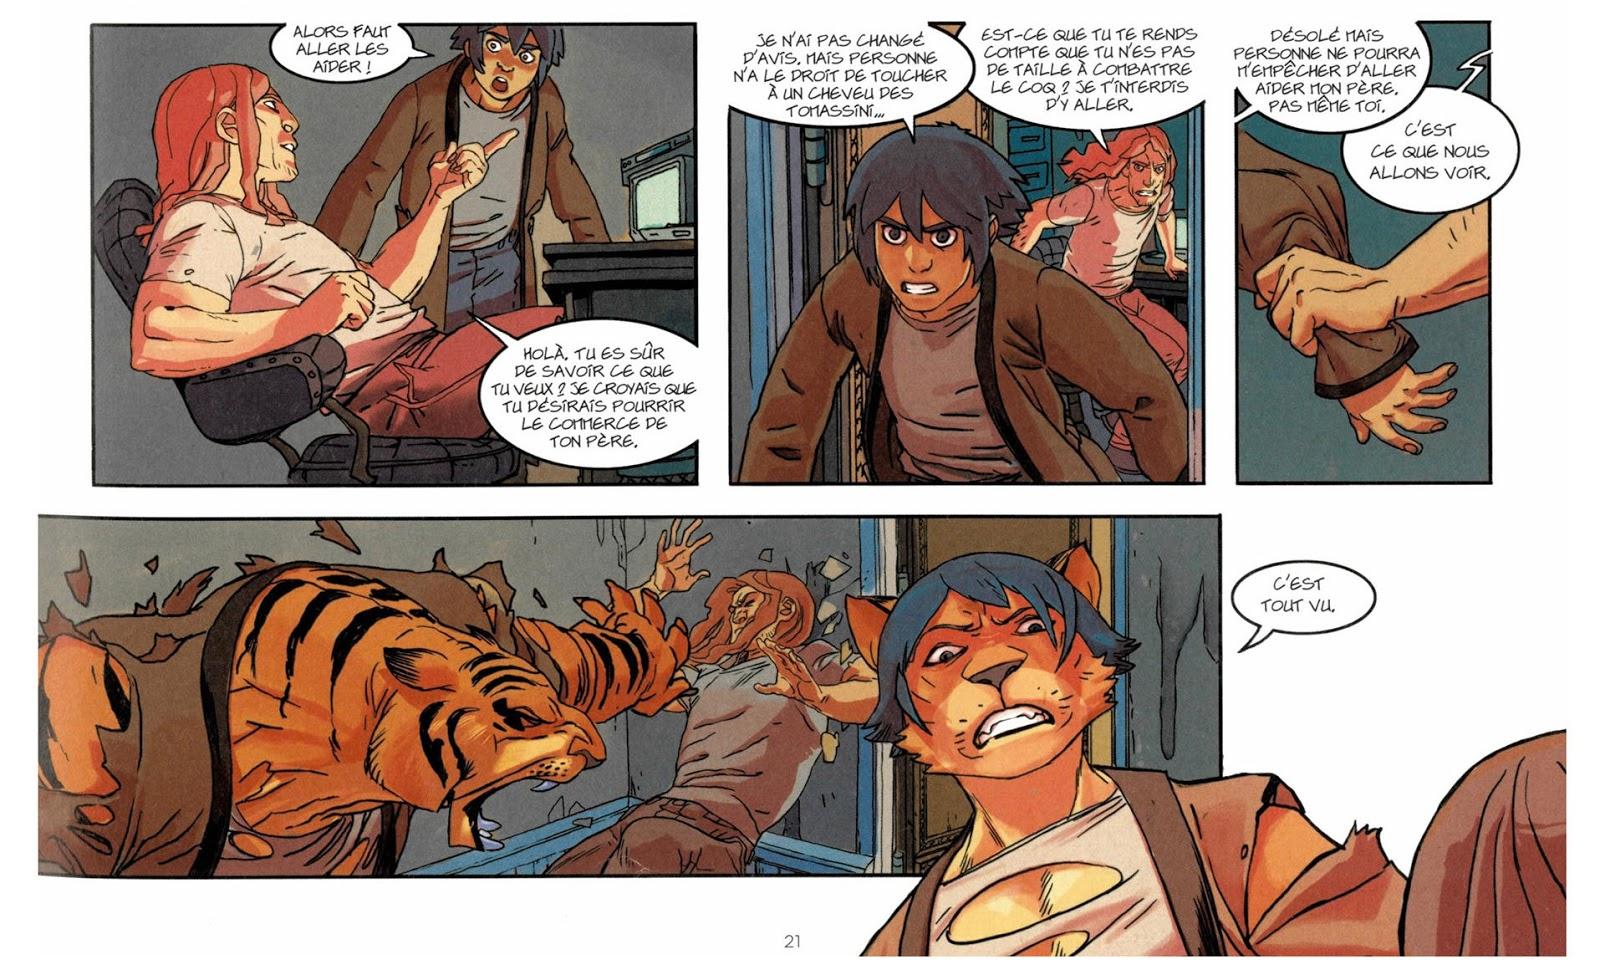 tiger erotic story